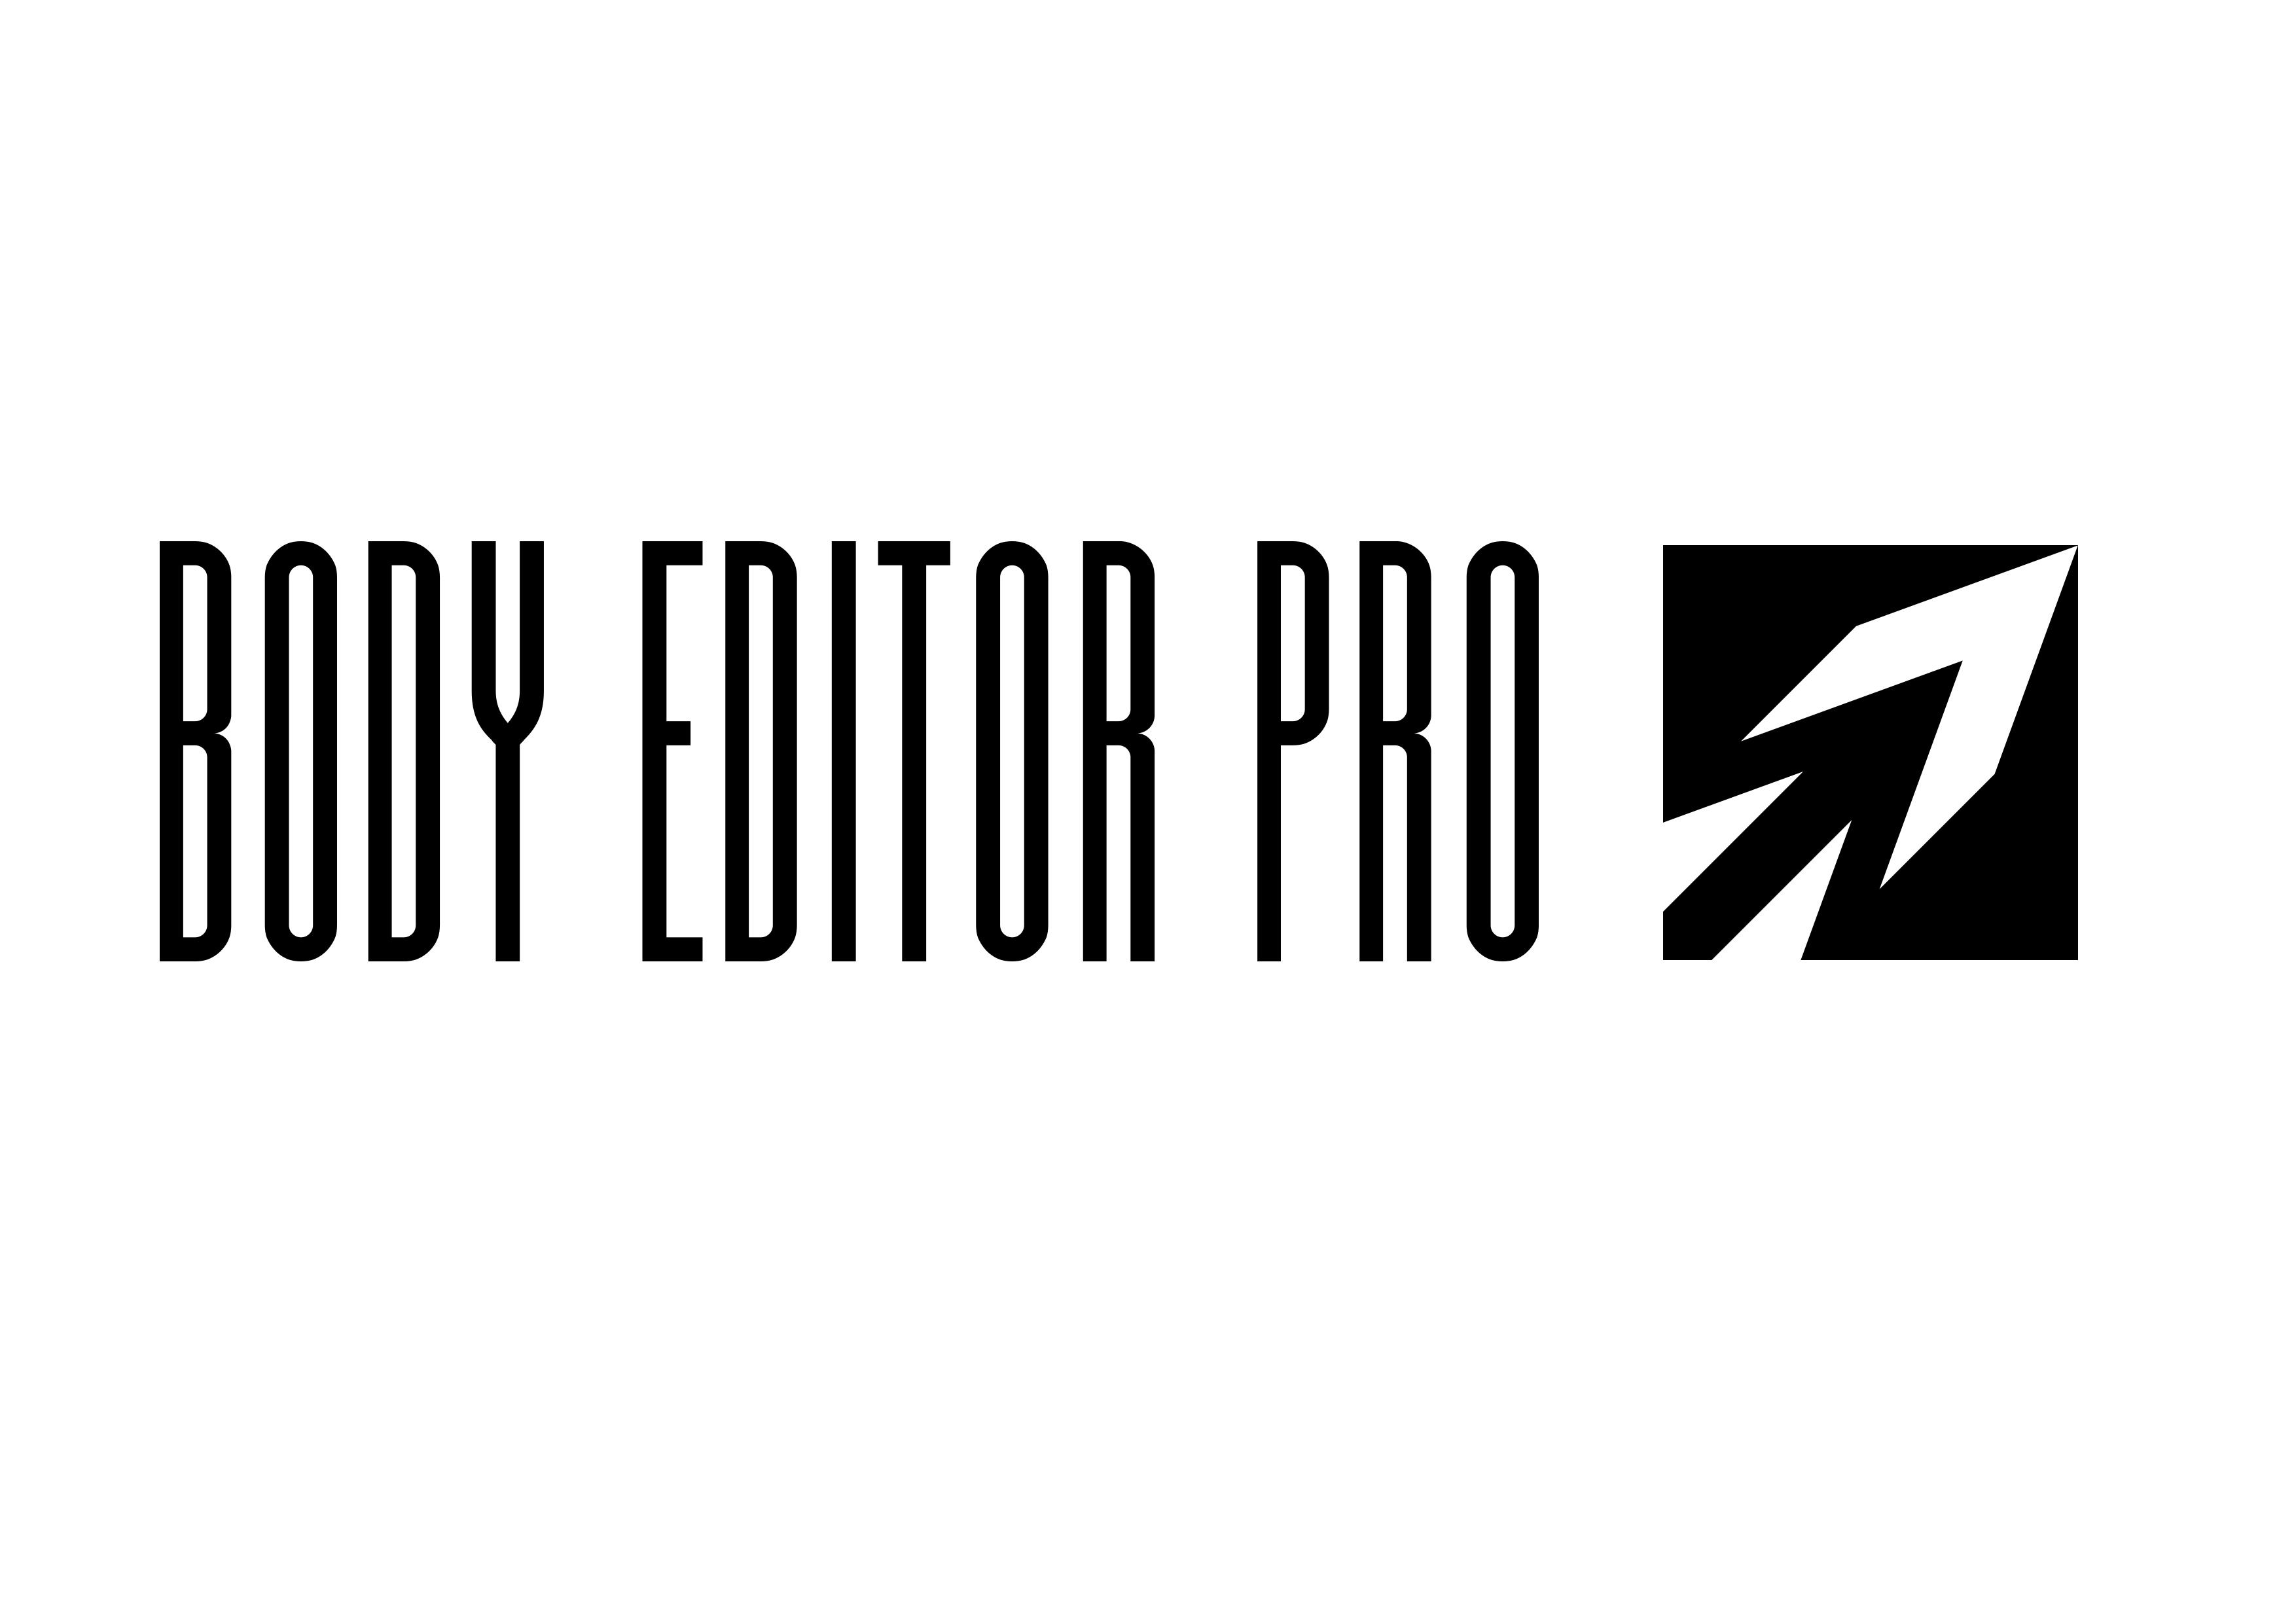 Лого+символ для марки Спортивного питания фото f_7145971e88403eed.jpg